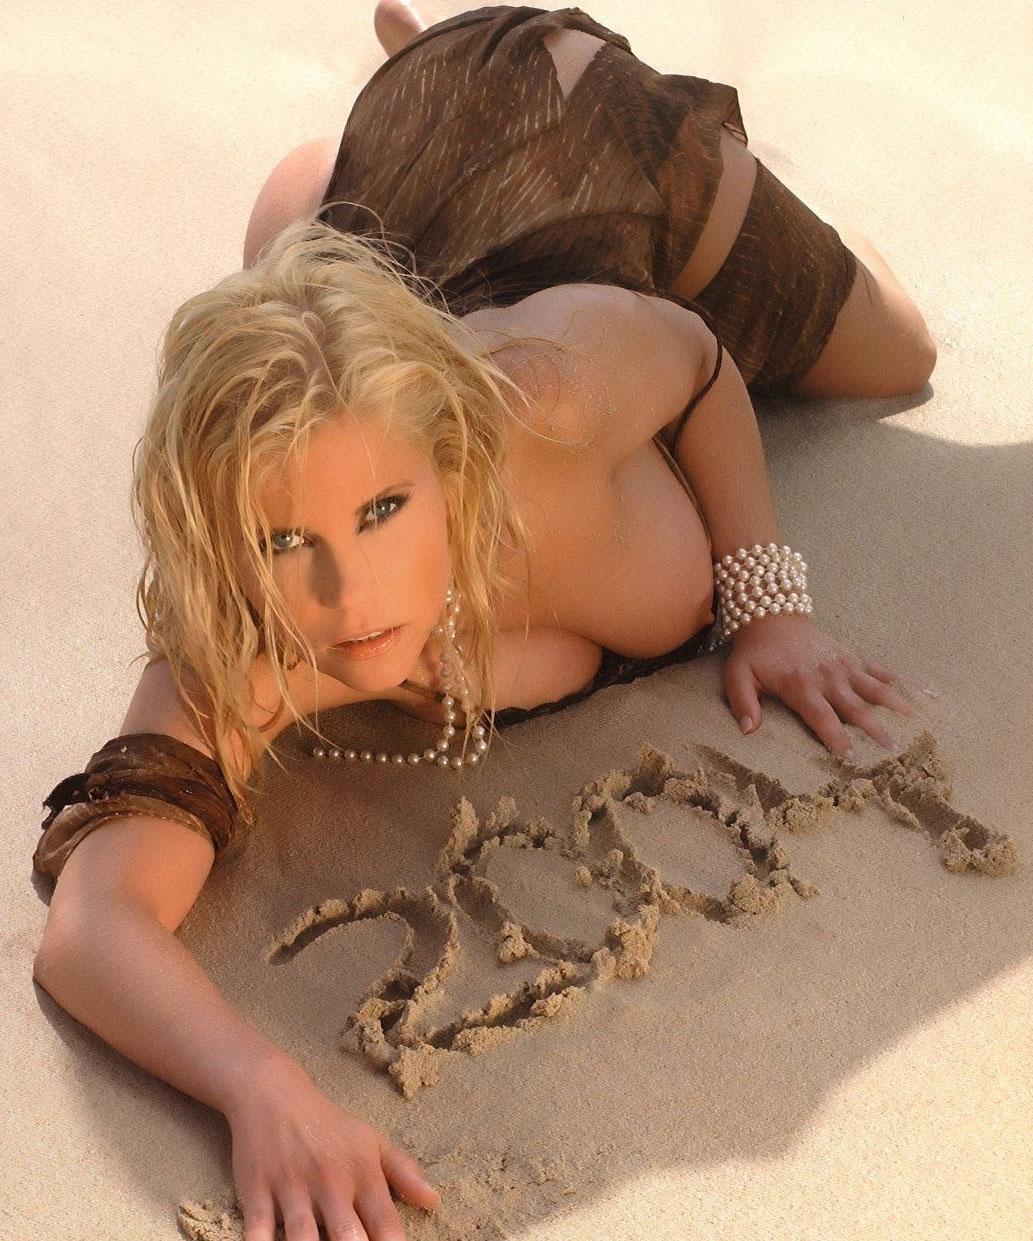 Михаэла Шаффрат (Gina Wild) голая. Фото - 74